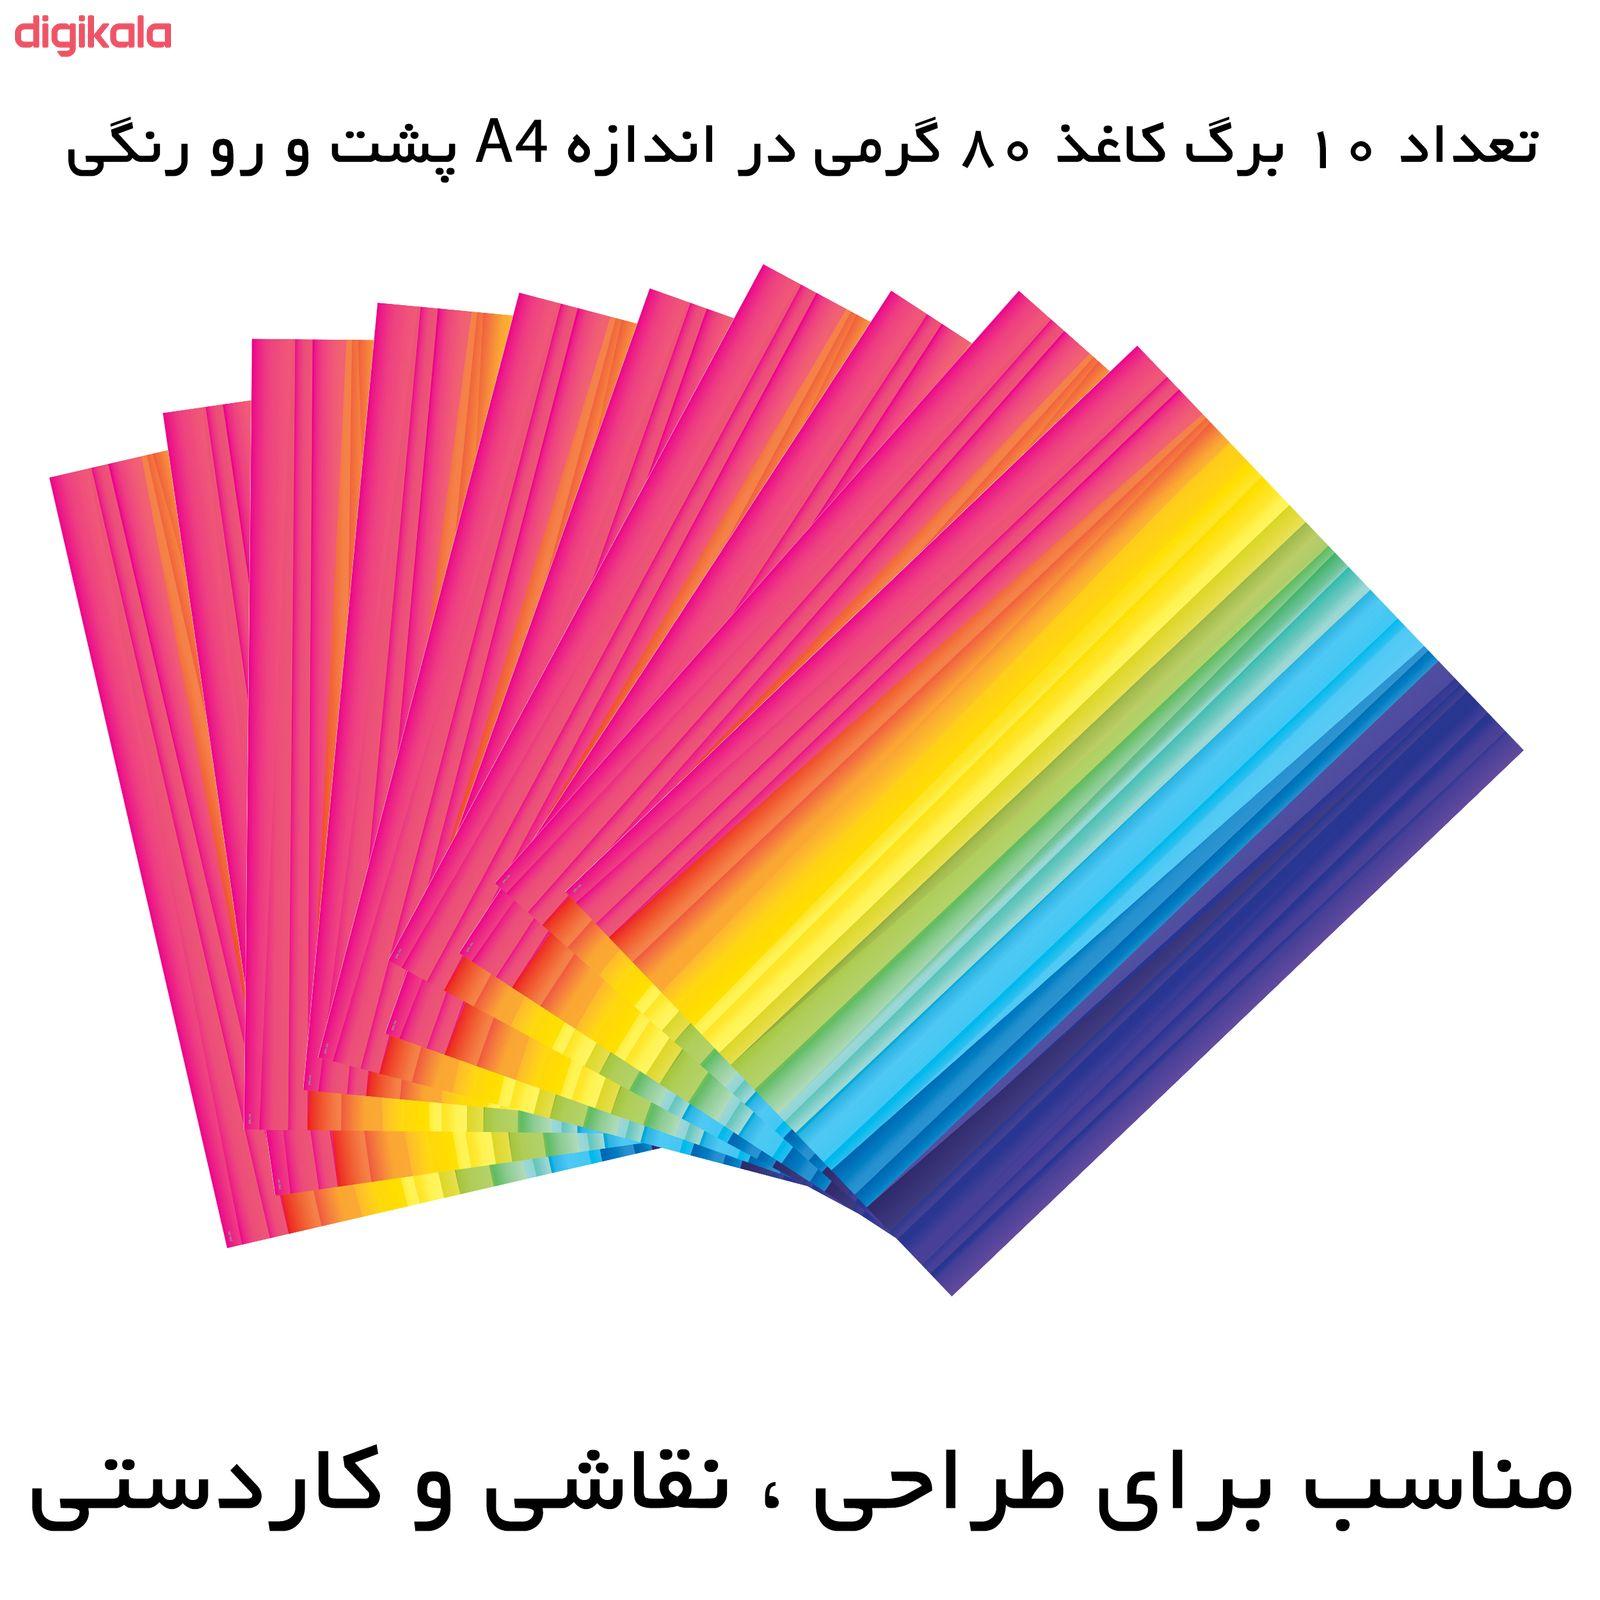 کاغذ رنگی A4 مستر راد مدل رنگارنگ بسته 10 عددی main 1 1